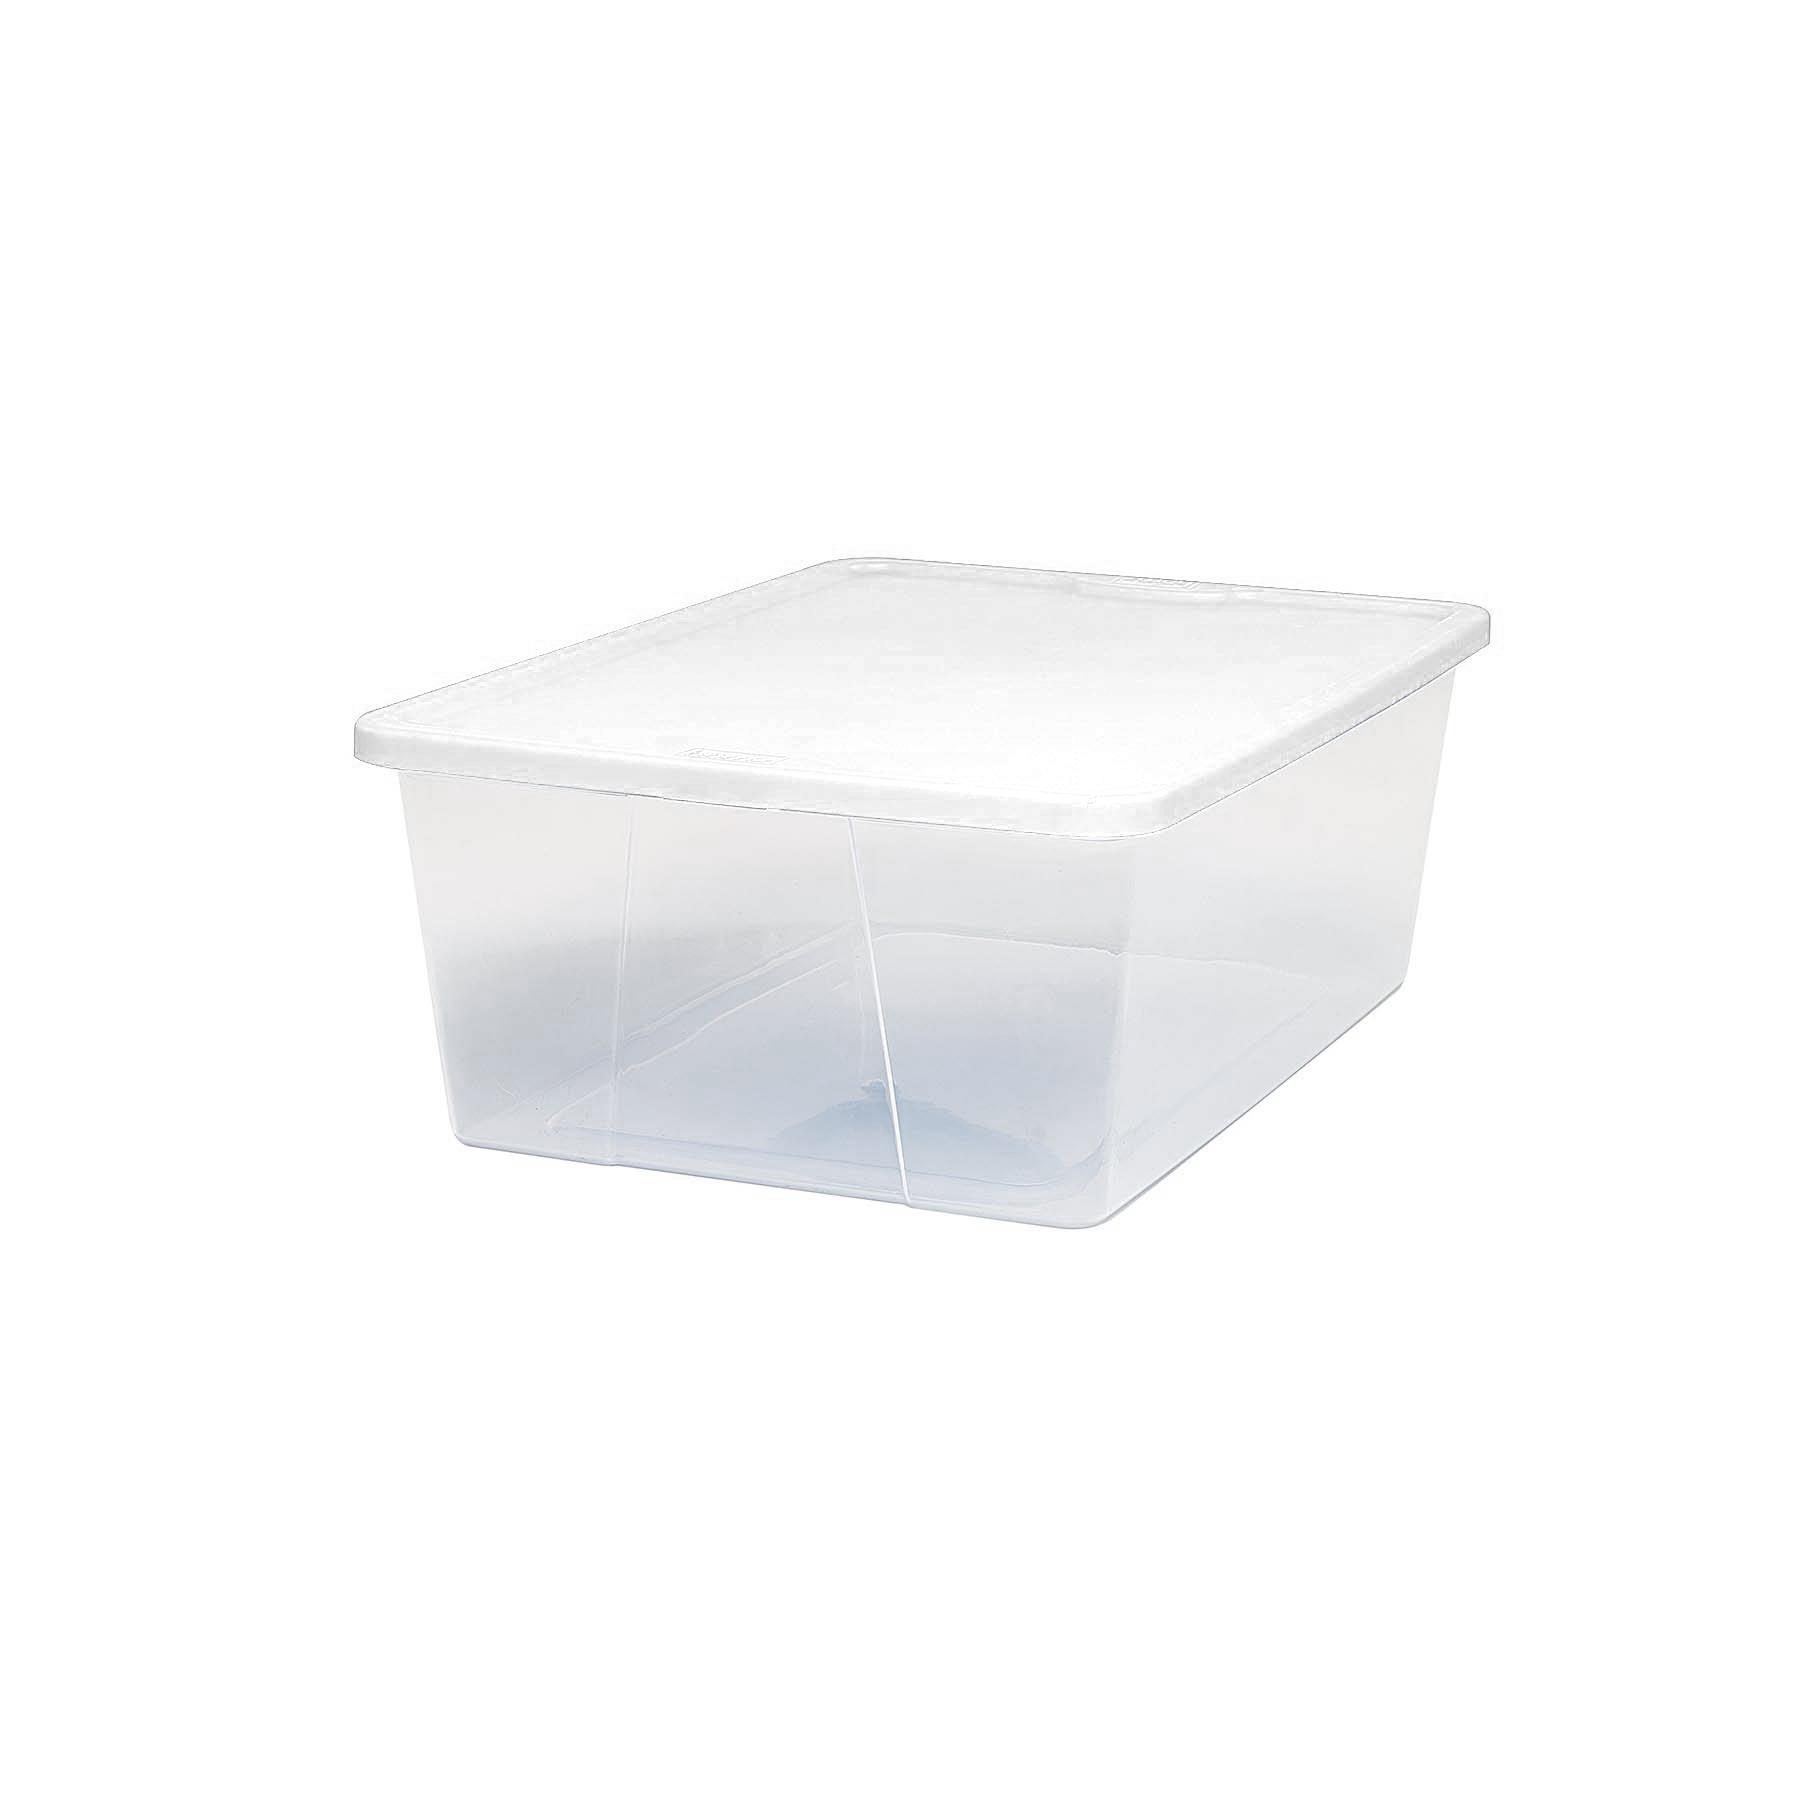 Homz Snaplock® 12 Quart Clear Storage Container, Set of 8